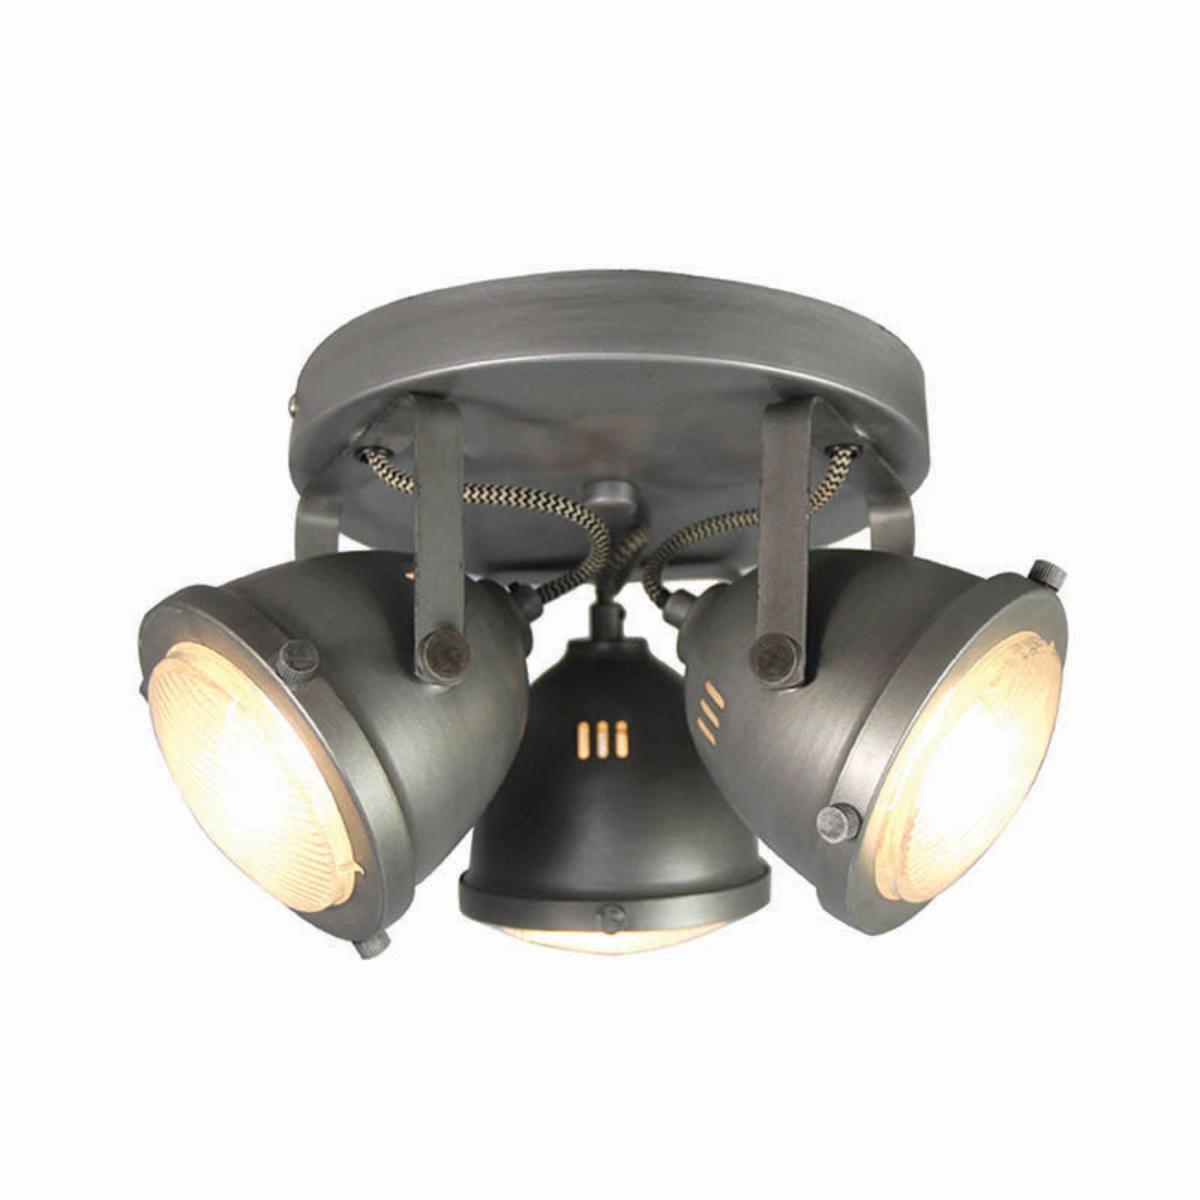 LED_Spot_Moto_3-lichts_Burned_Steel_29_7x29_7x16_3_cm.jpg